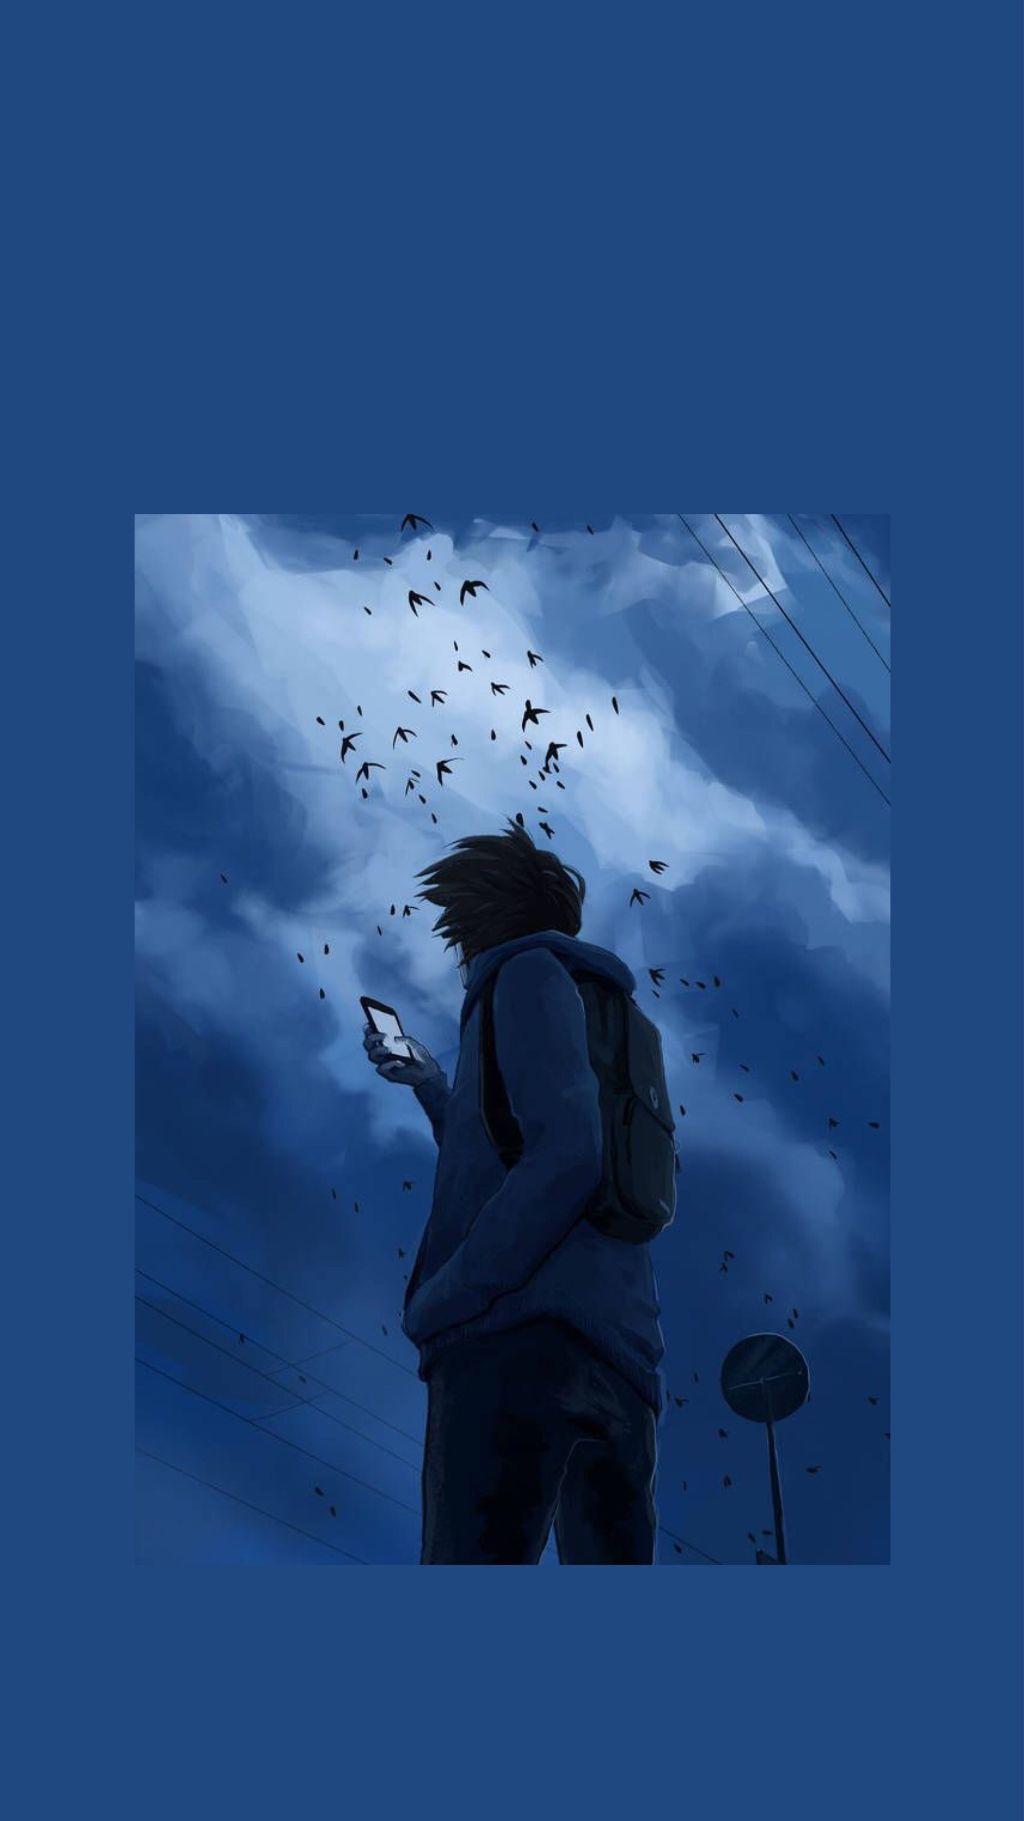 Art Wallpaper Lockscreen Sad Aesthetic Anime